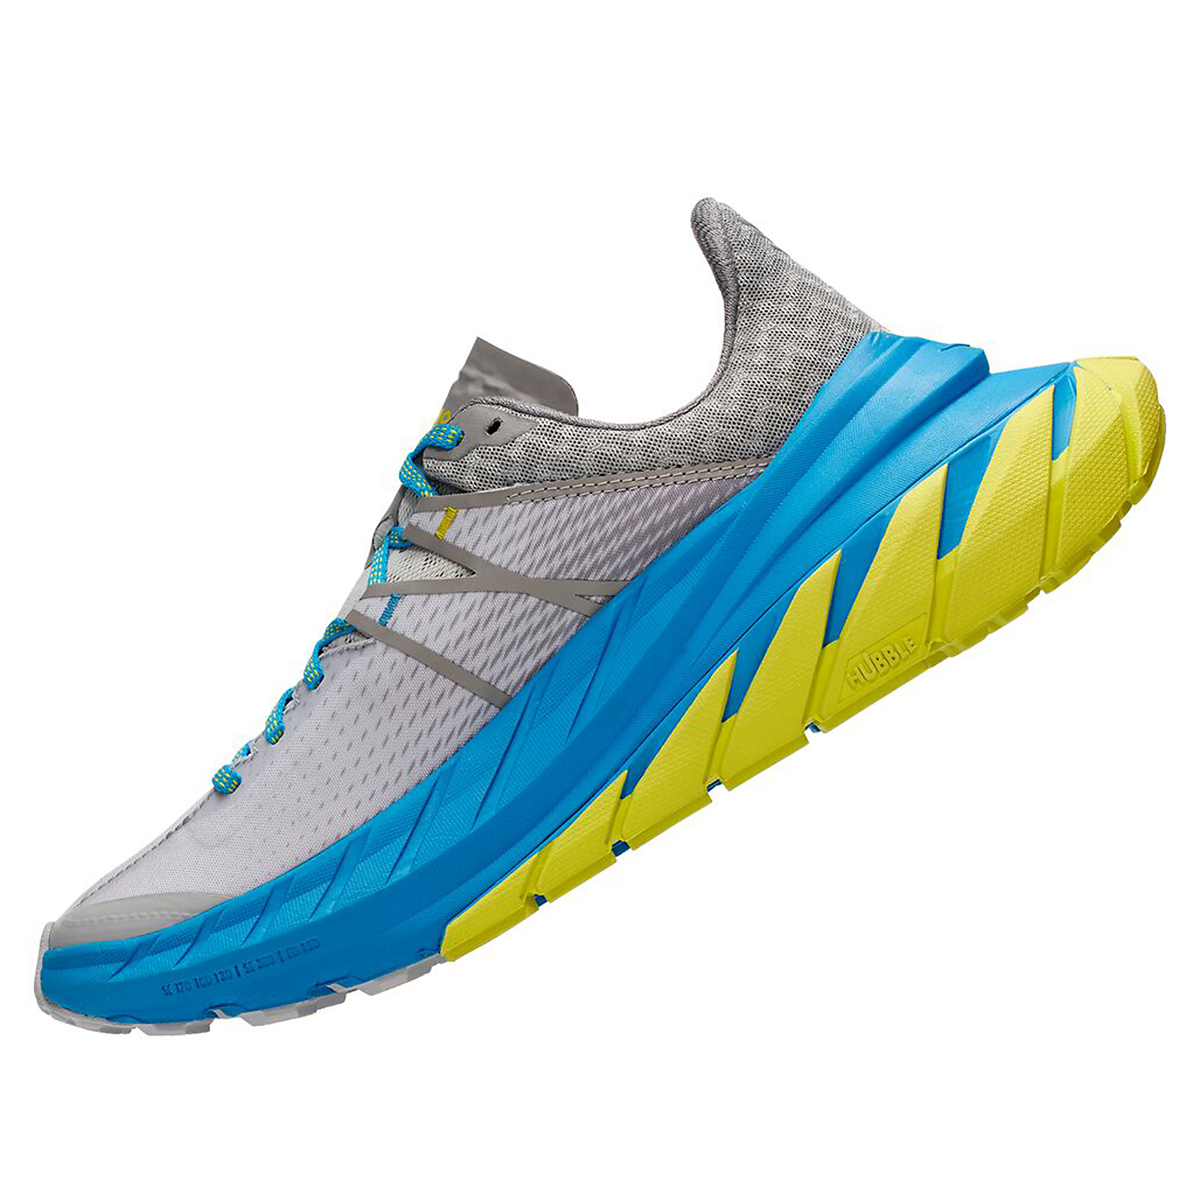 Men's Hoka One One Tennine Running Shoe - Color: Drizzle/Lunar Rock - Size: 8 - Width: Regular, Drizzle/Lunar Rock, large, image 2